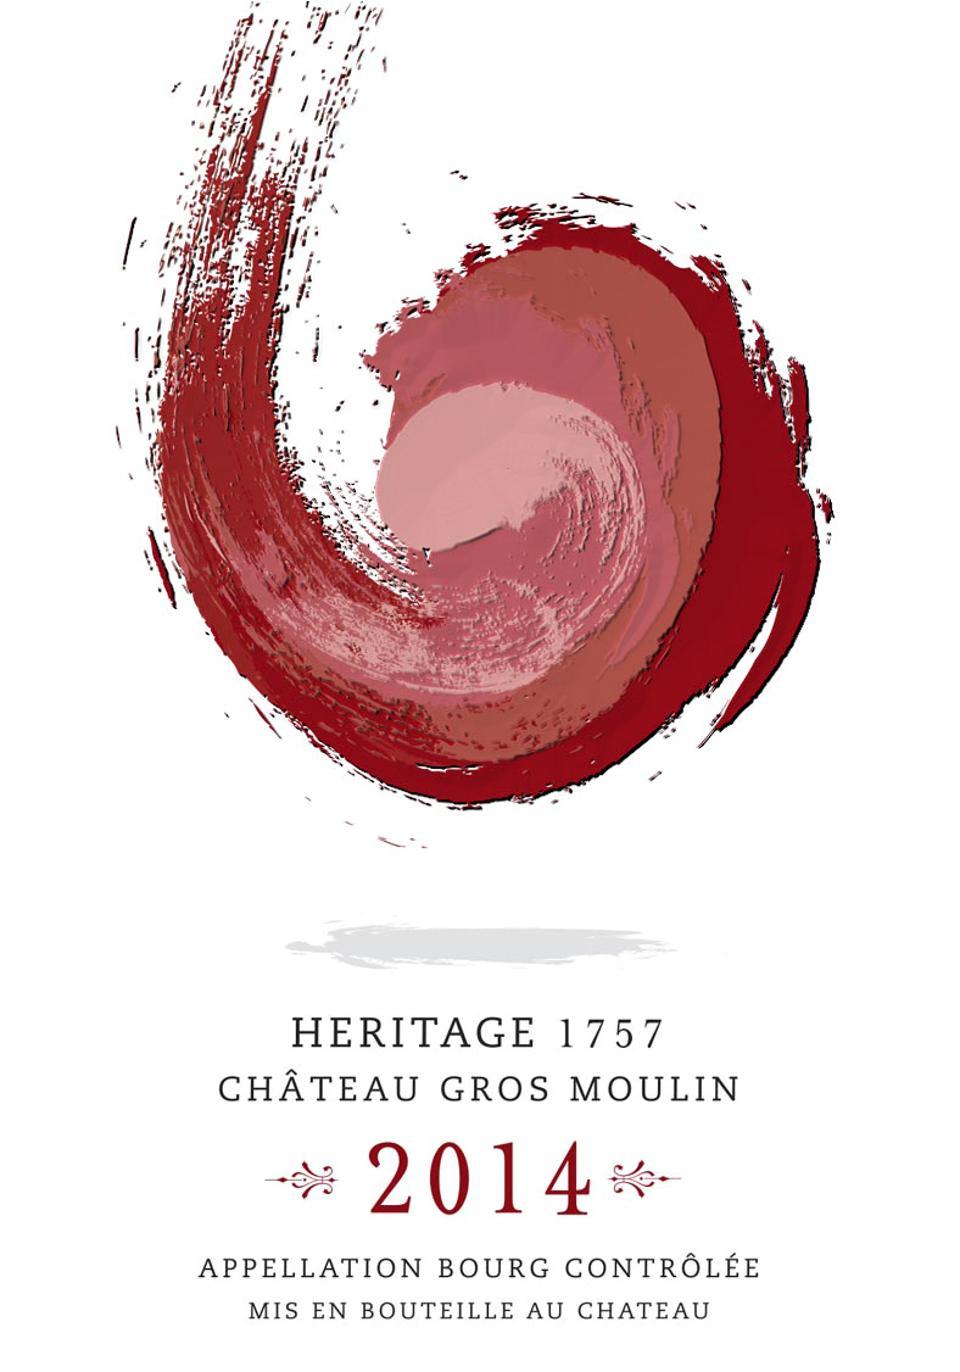 23-heritage-label-franklin-liquors